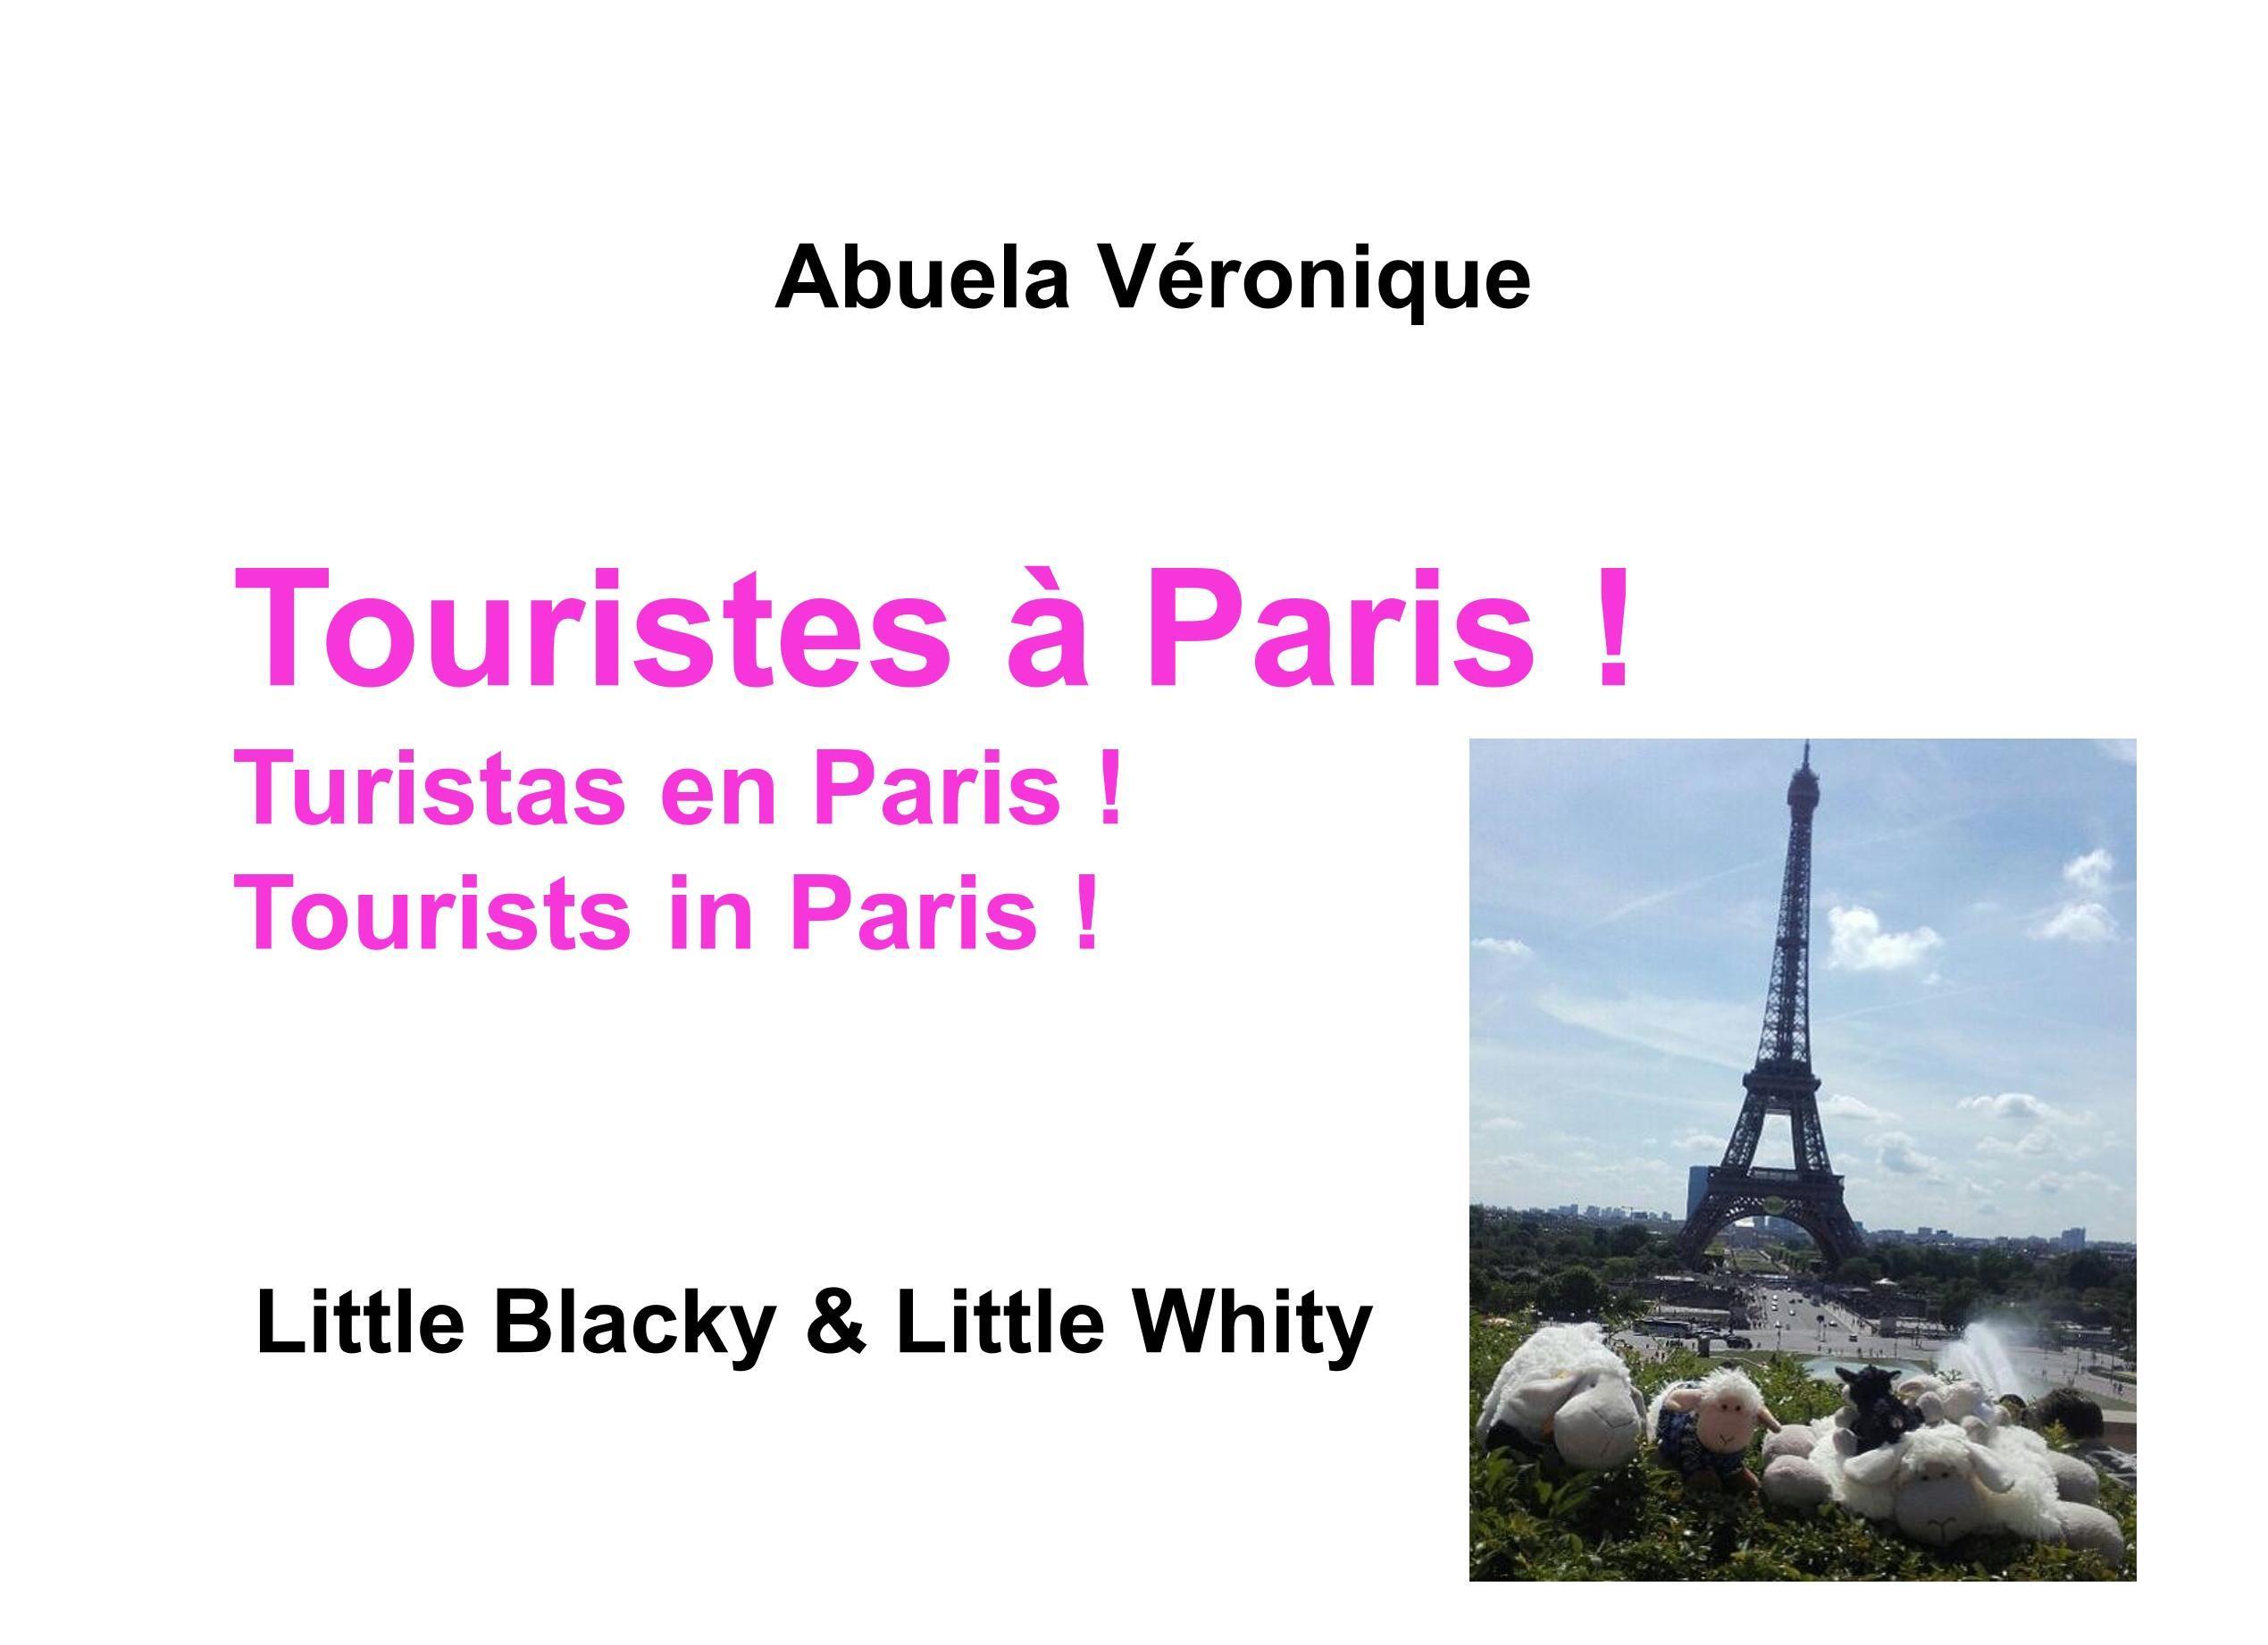 Touristes à Paris !  Little Blacky & Little Whity  Abuela Véronique  Buch  HC gerader Rücken kaschiert  Französisch  2018 - Véronique, Abuela